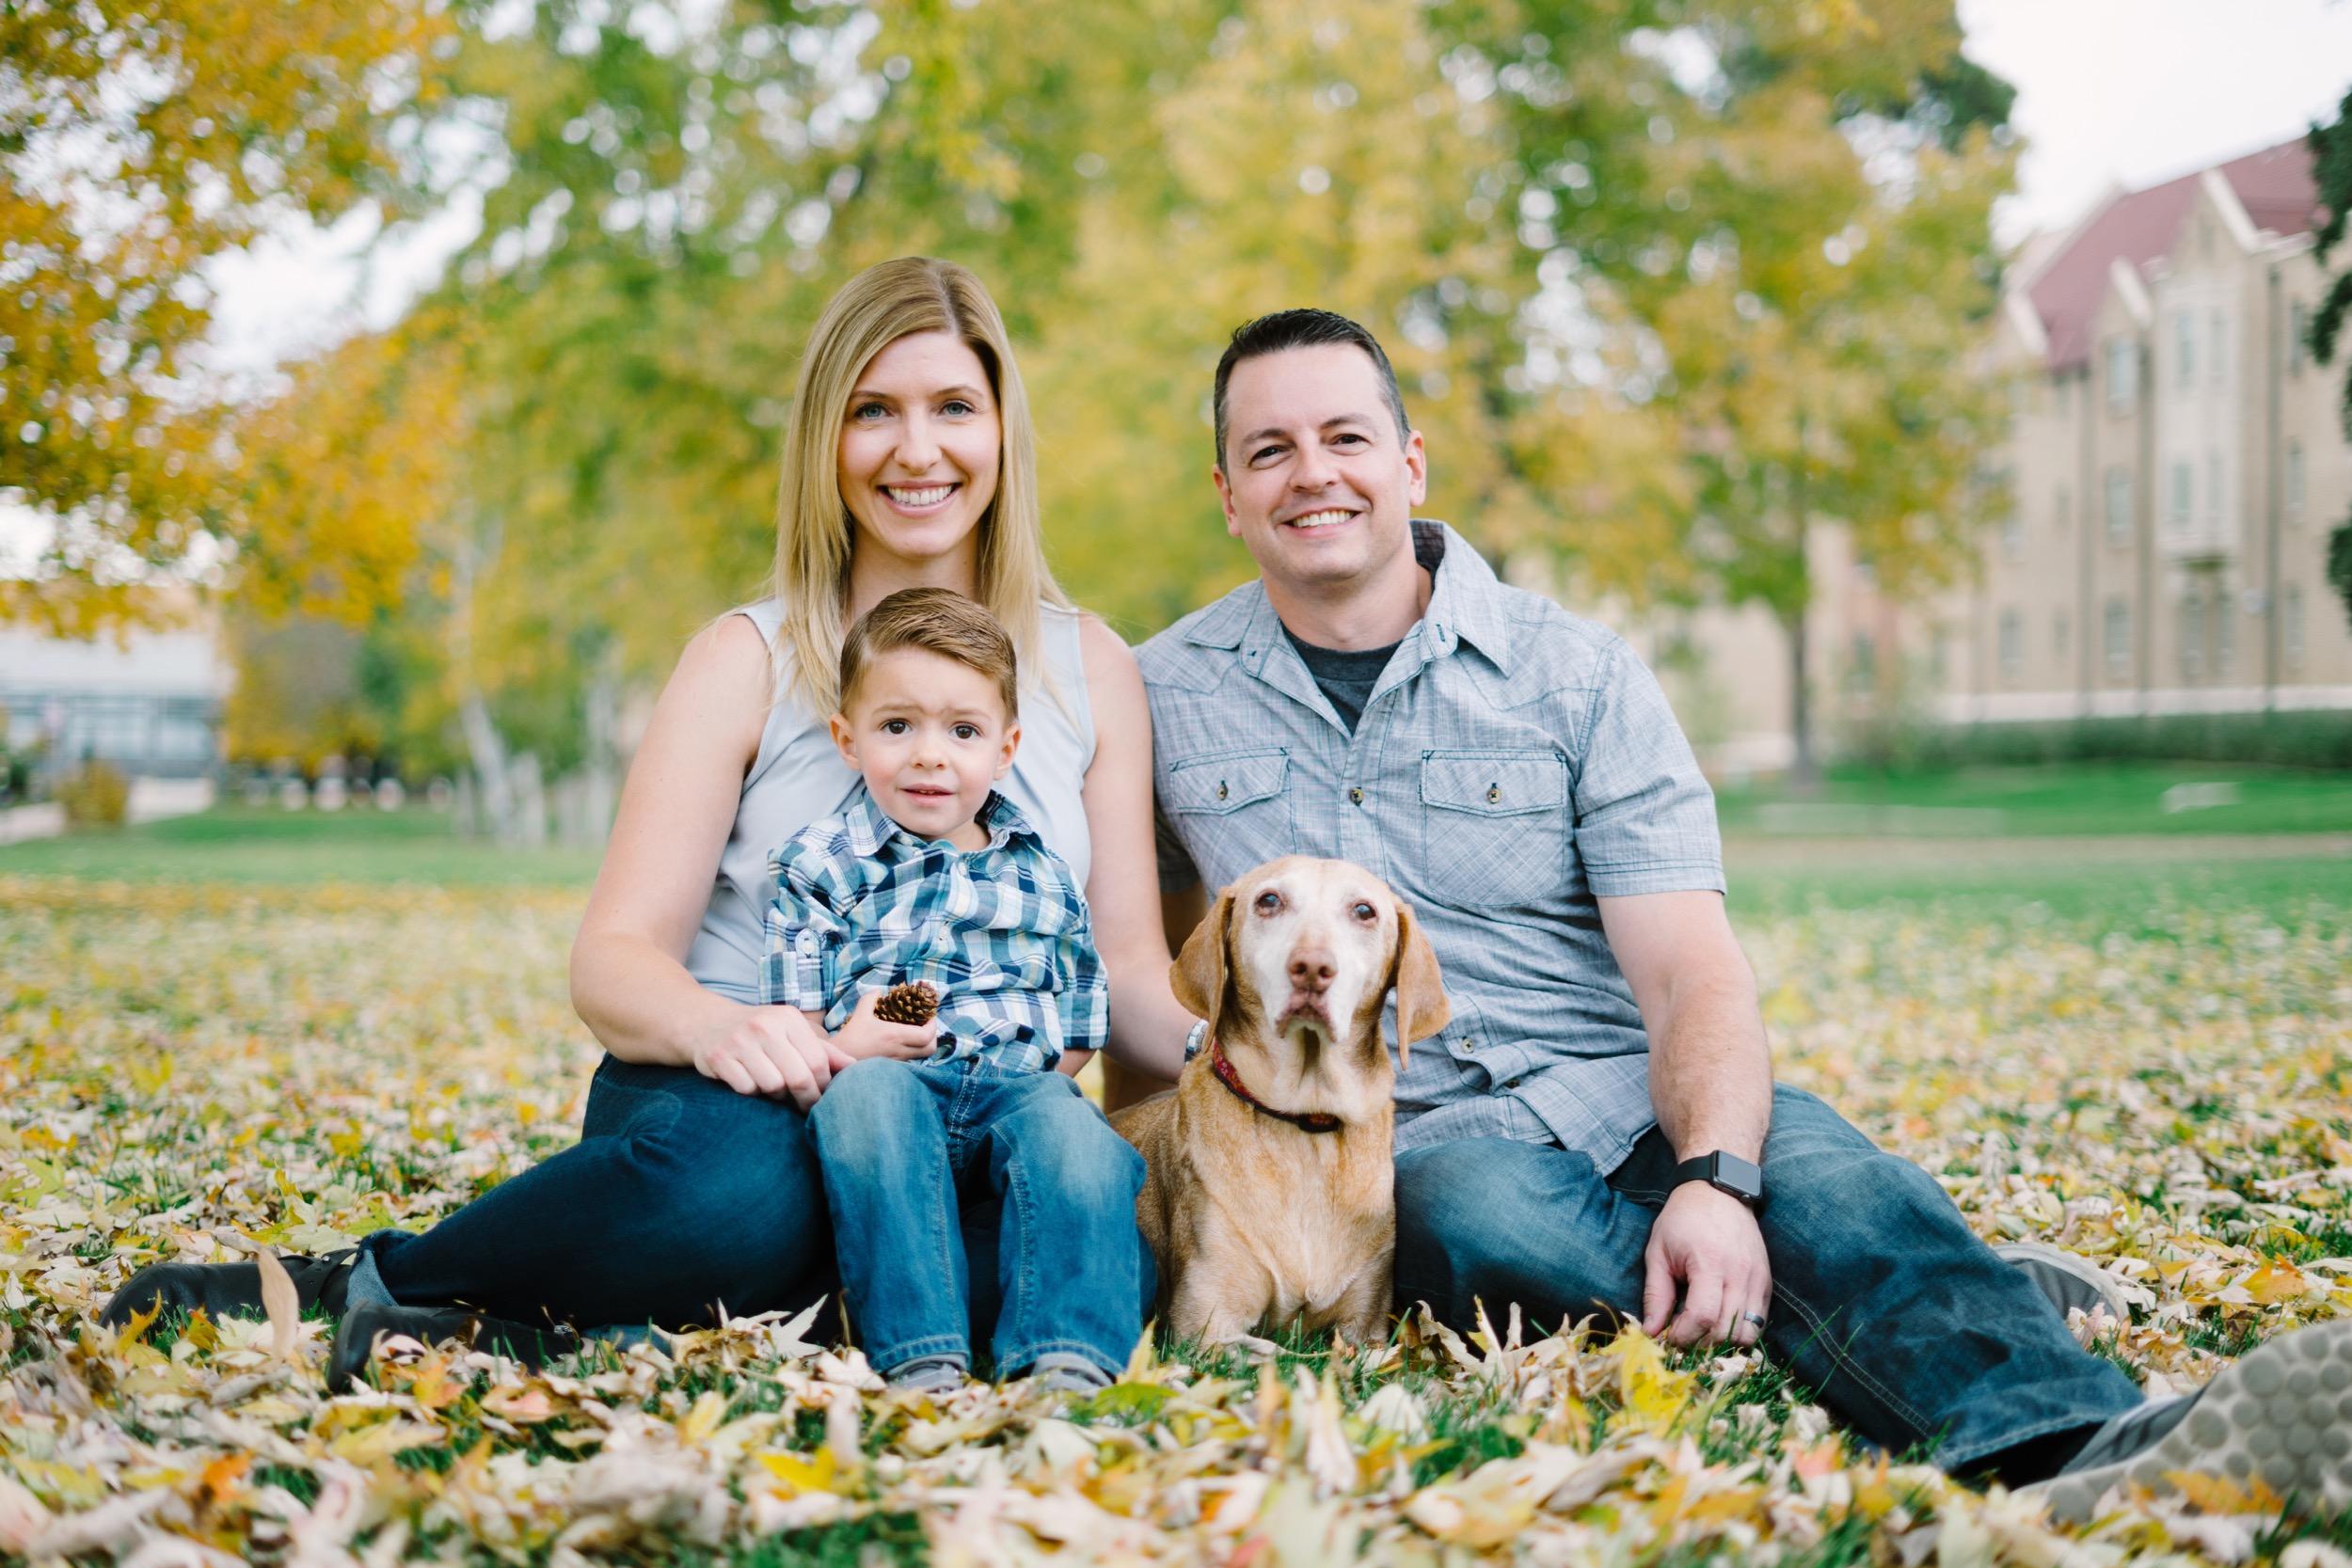 Denver Family Photography Dr. Bates - 2.jpg